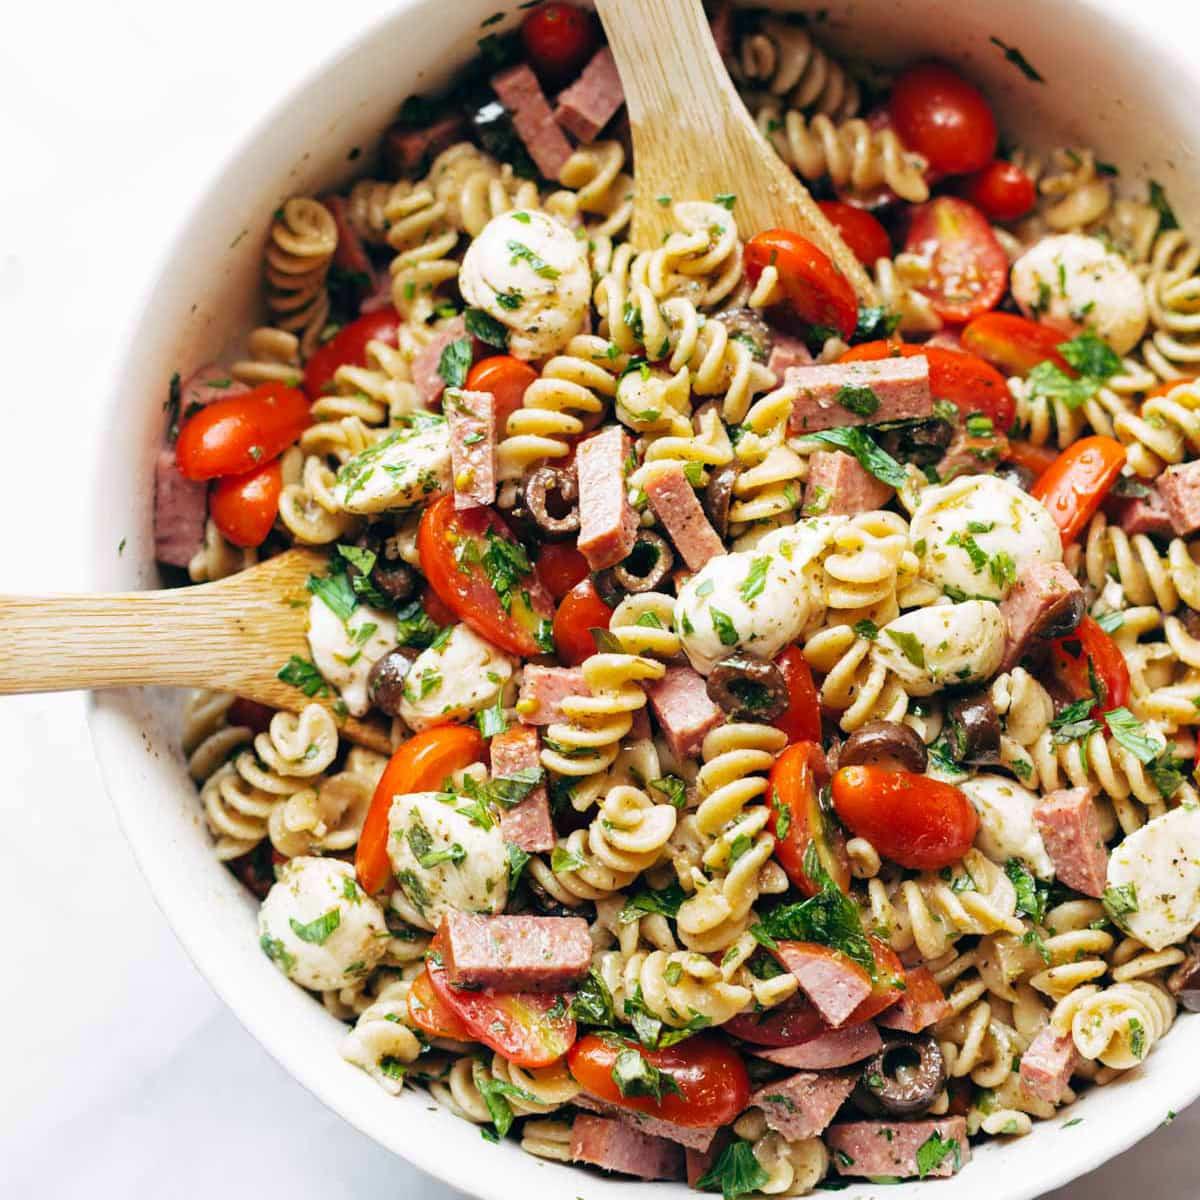 Pasta Salad Recipes Easy  Best Easy Italian Pasta Salad Recipe Pinch of Yum